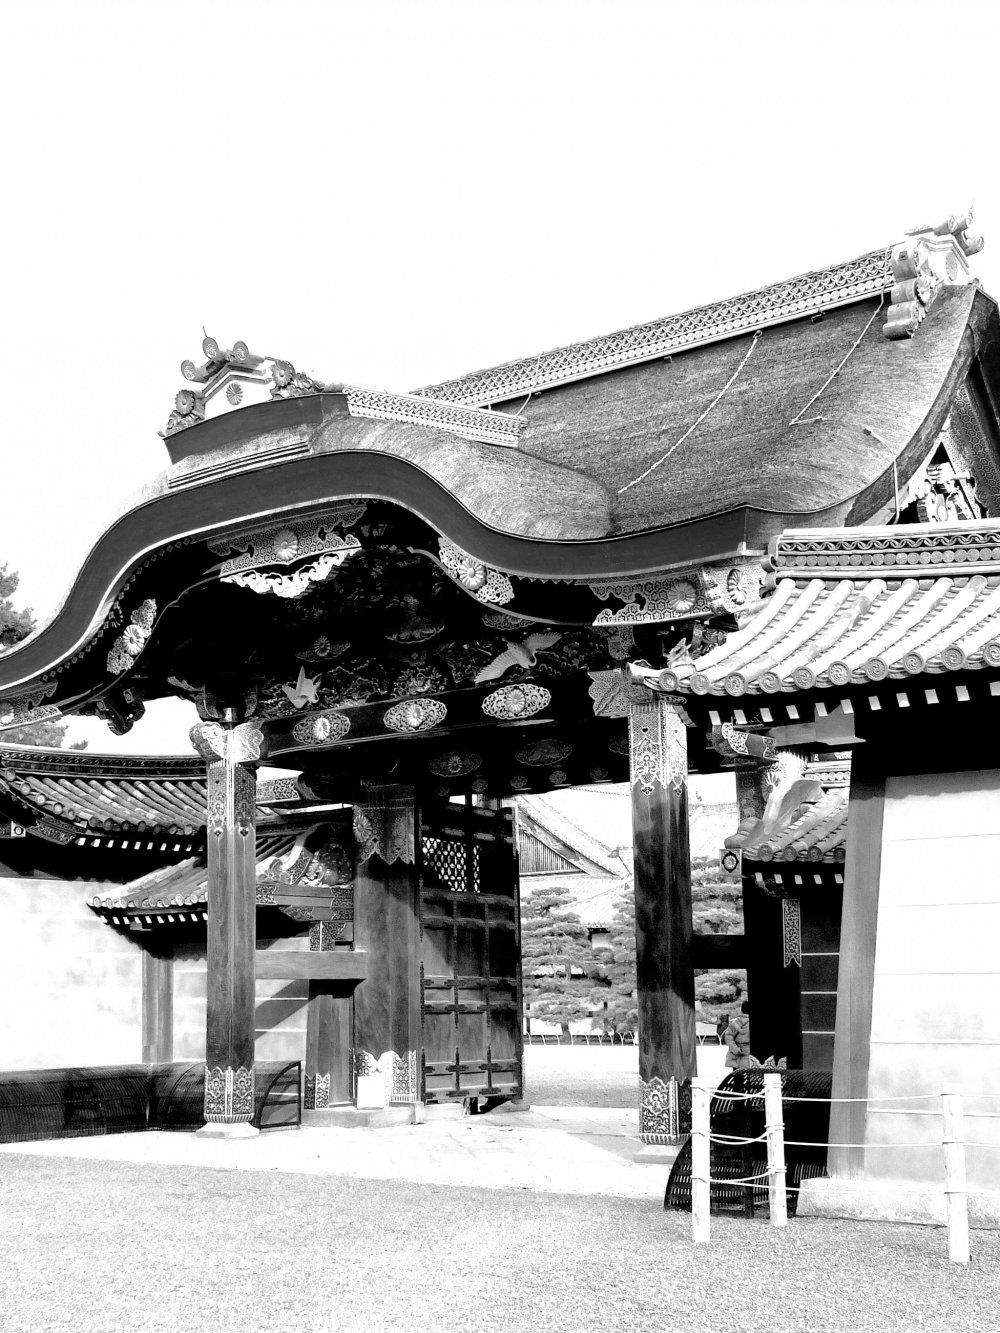 The Main Gate